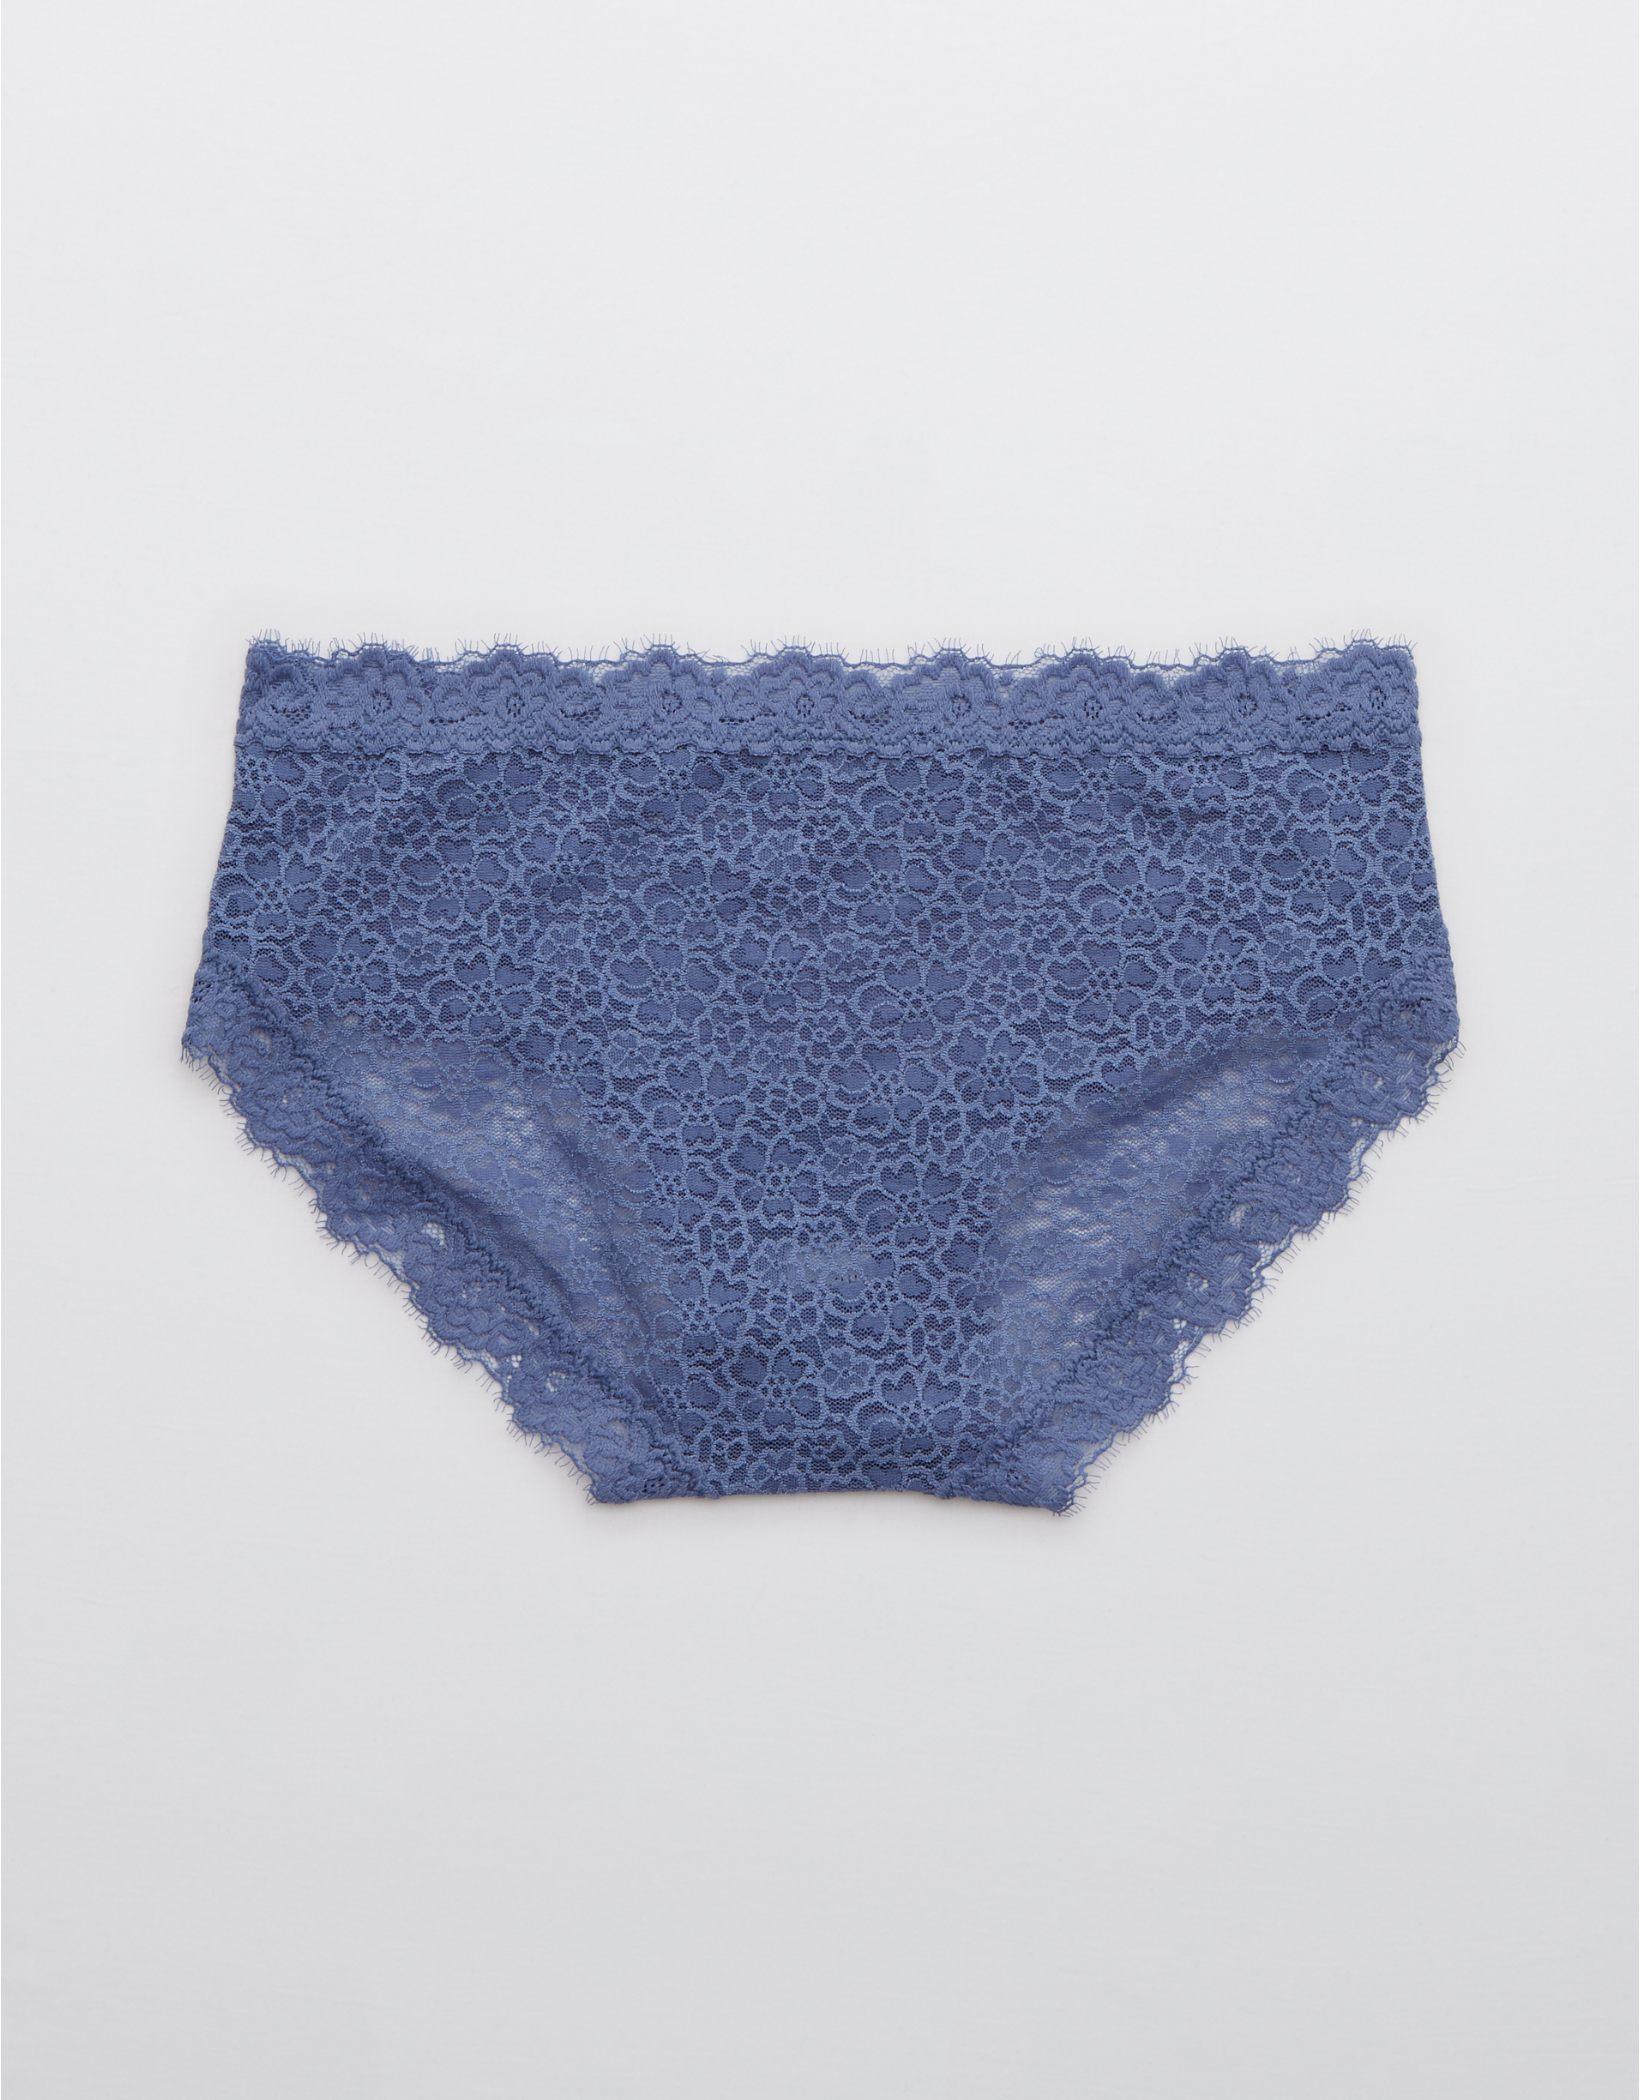 Aerie Eyelash Lace Boybrief Underwear